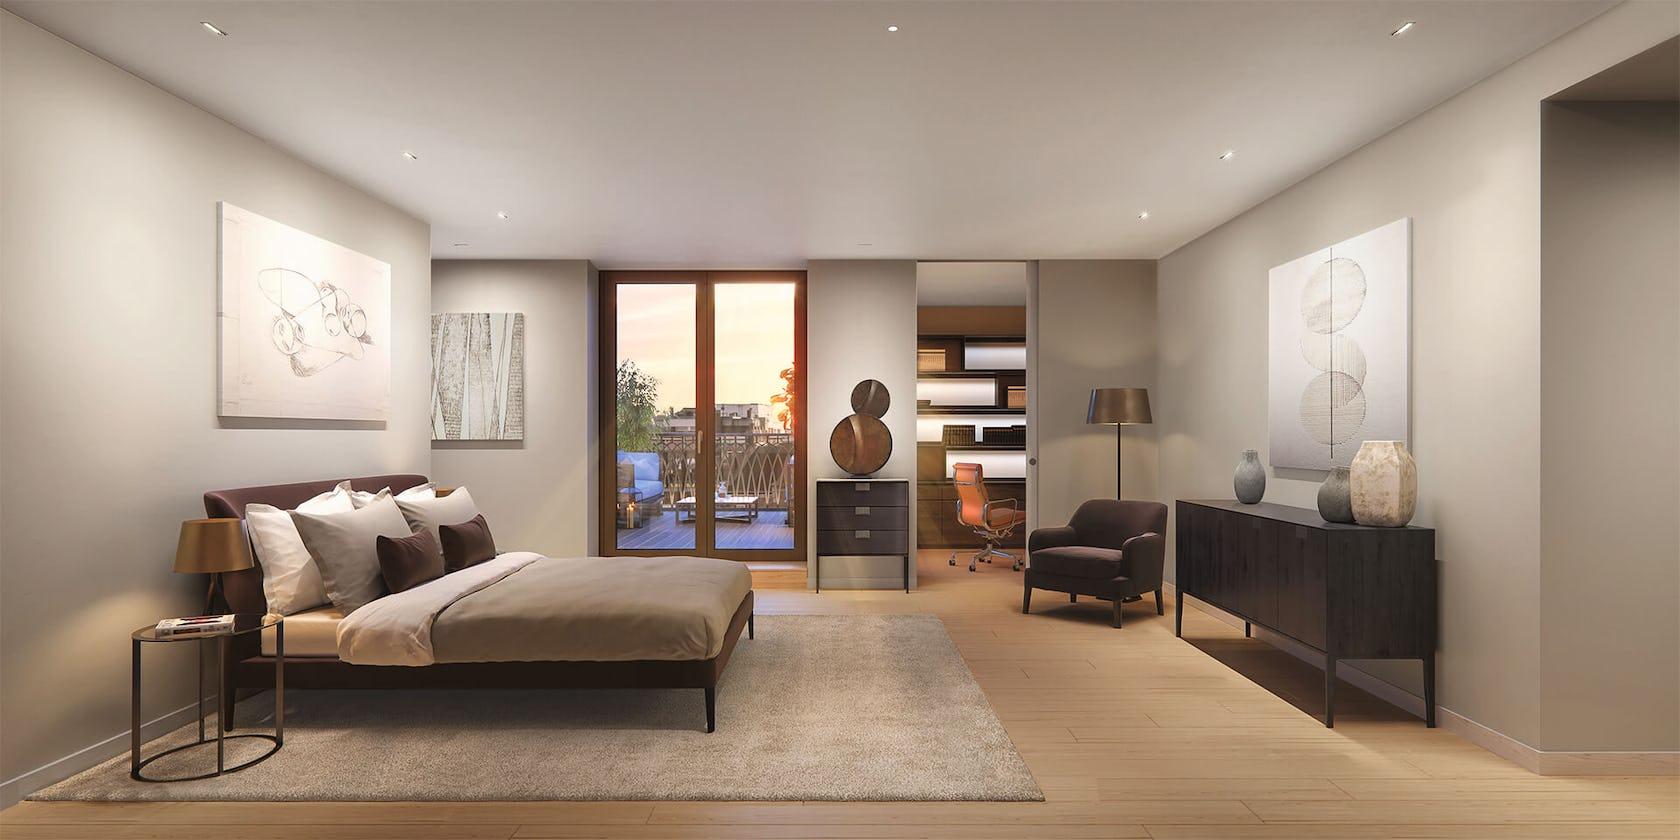 furniture bedroom indoors room interior design living room